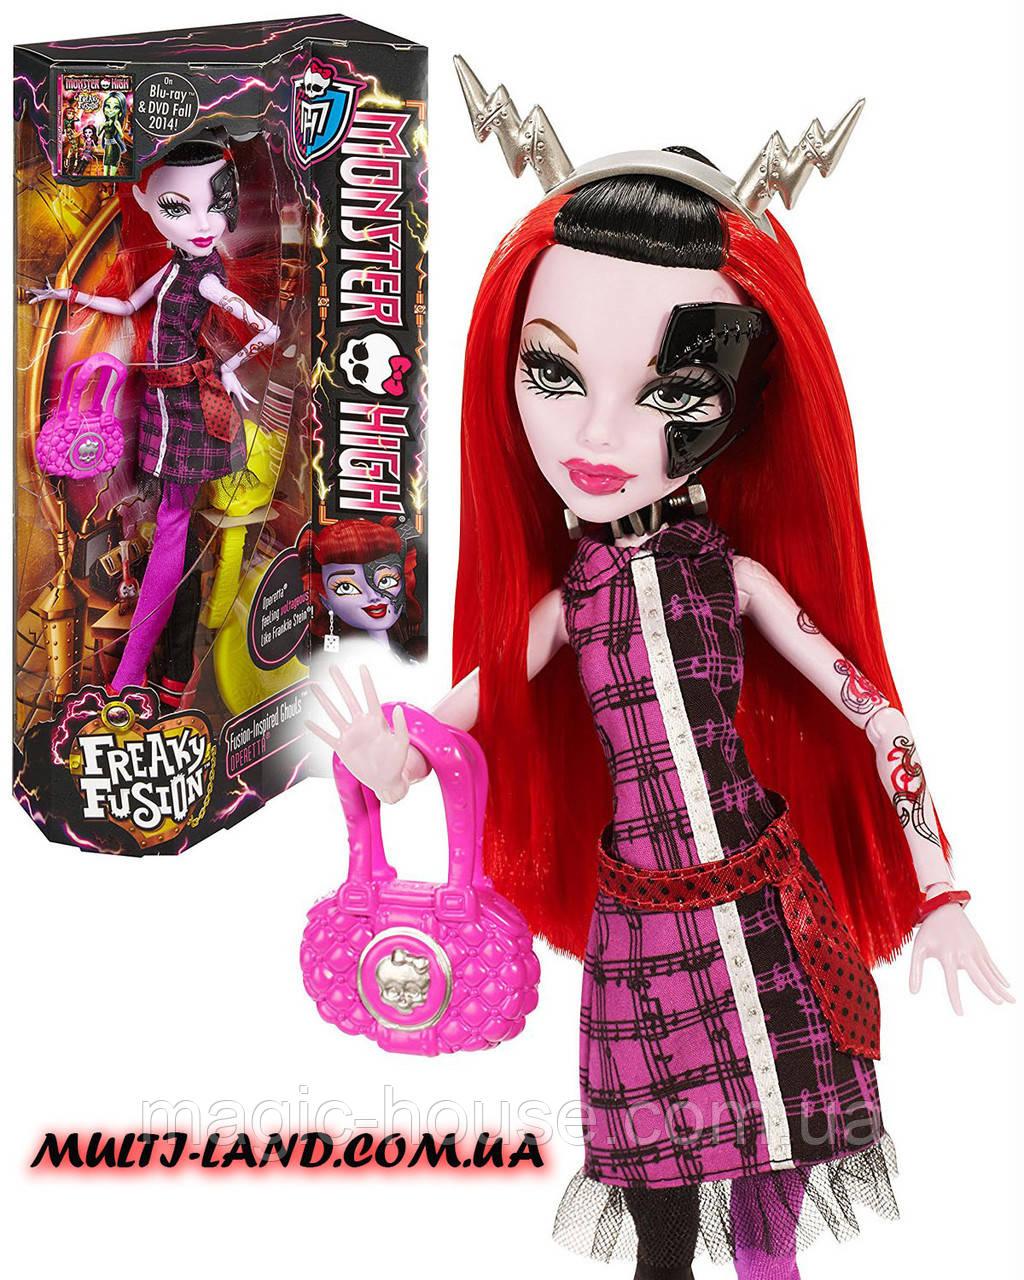 Уценка! Кукла Монстер Хай Оперетта из серии Слияние монстров Monster High Freaky Fusion Operetta Doll